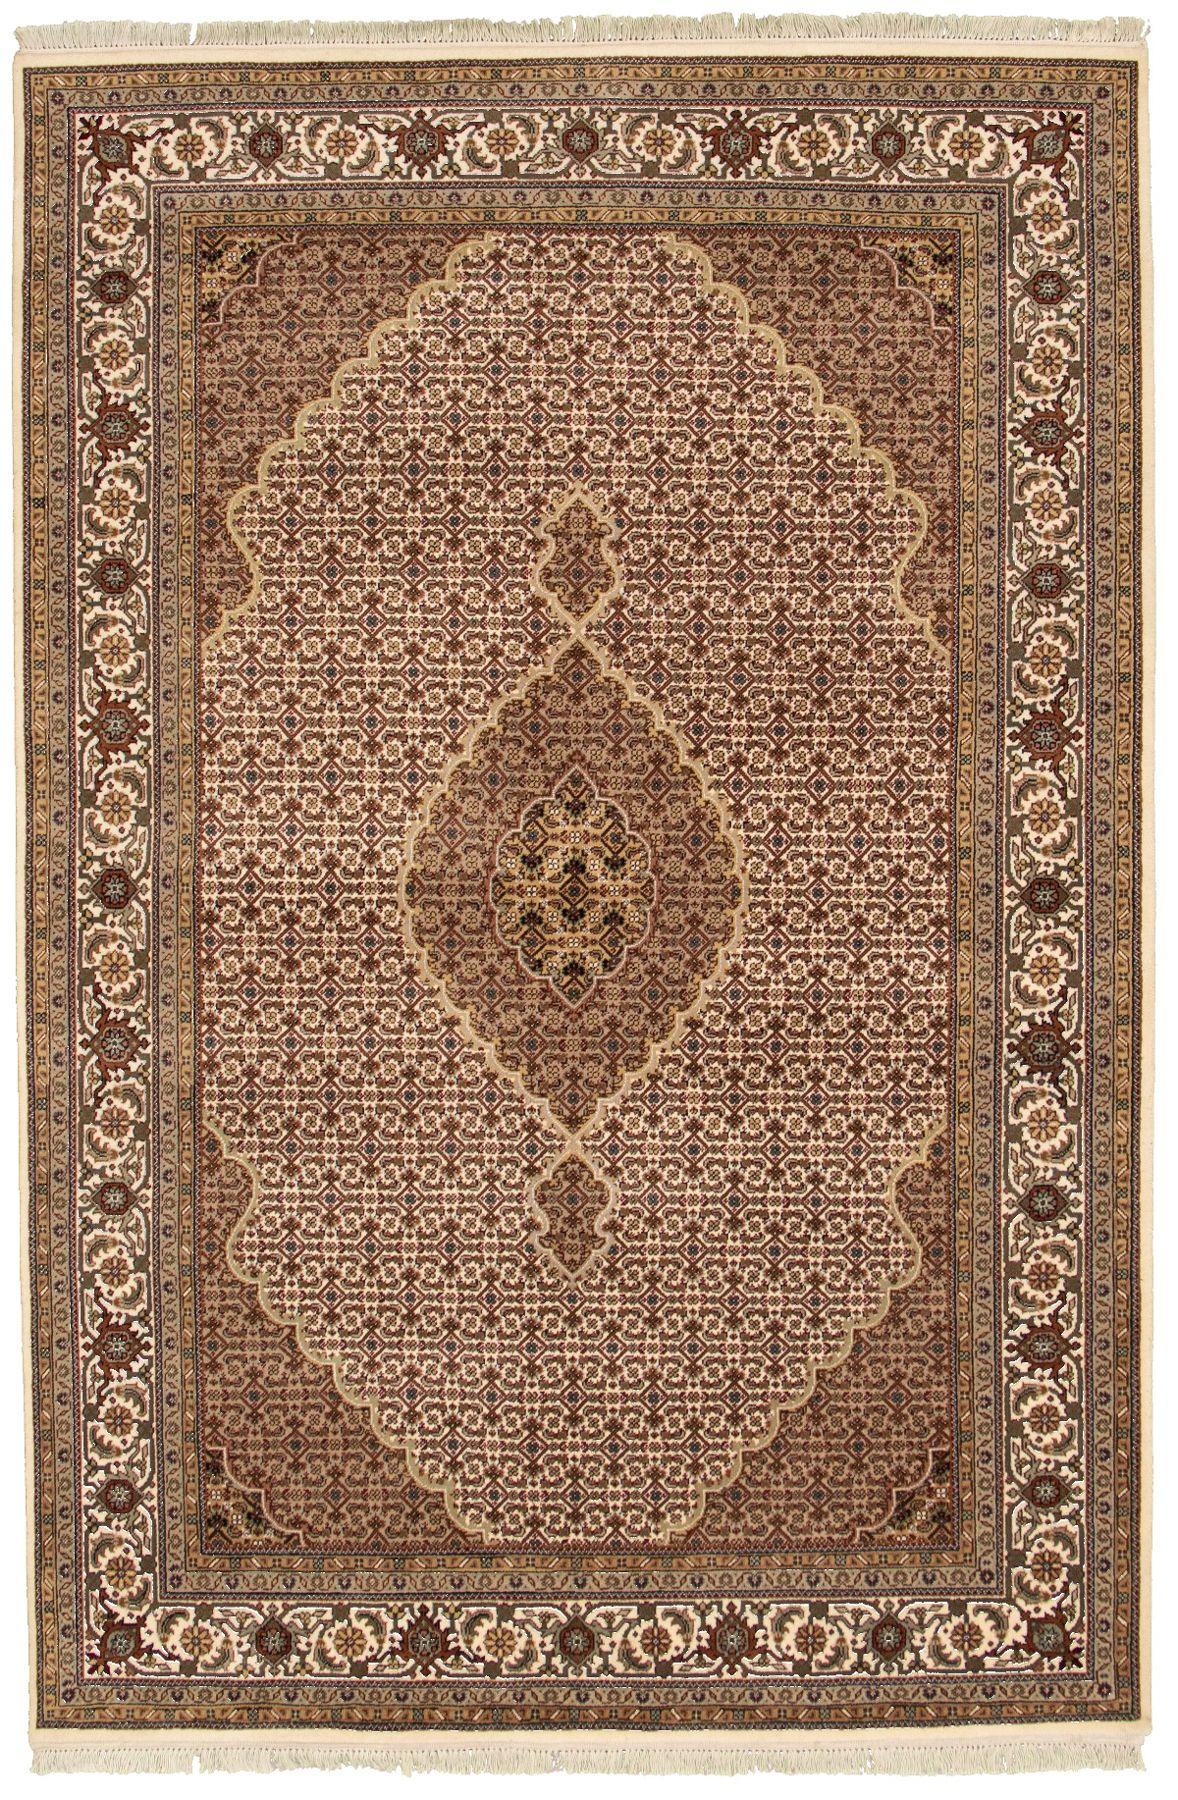 "Hand-knotted Tabriz Haj Jalili Cream Wool Rug 5'7"" x 7'9""  Size: 5'7"" x 7'9"""